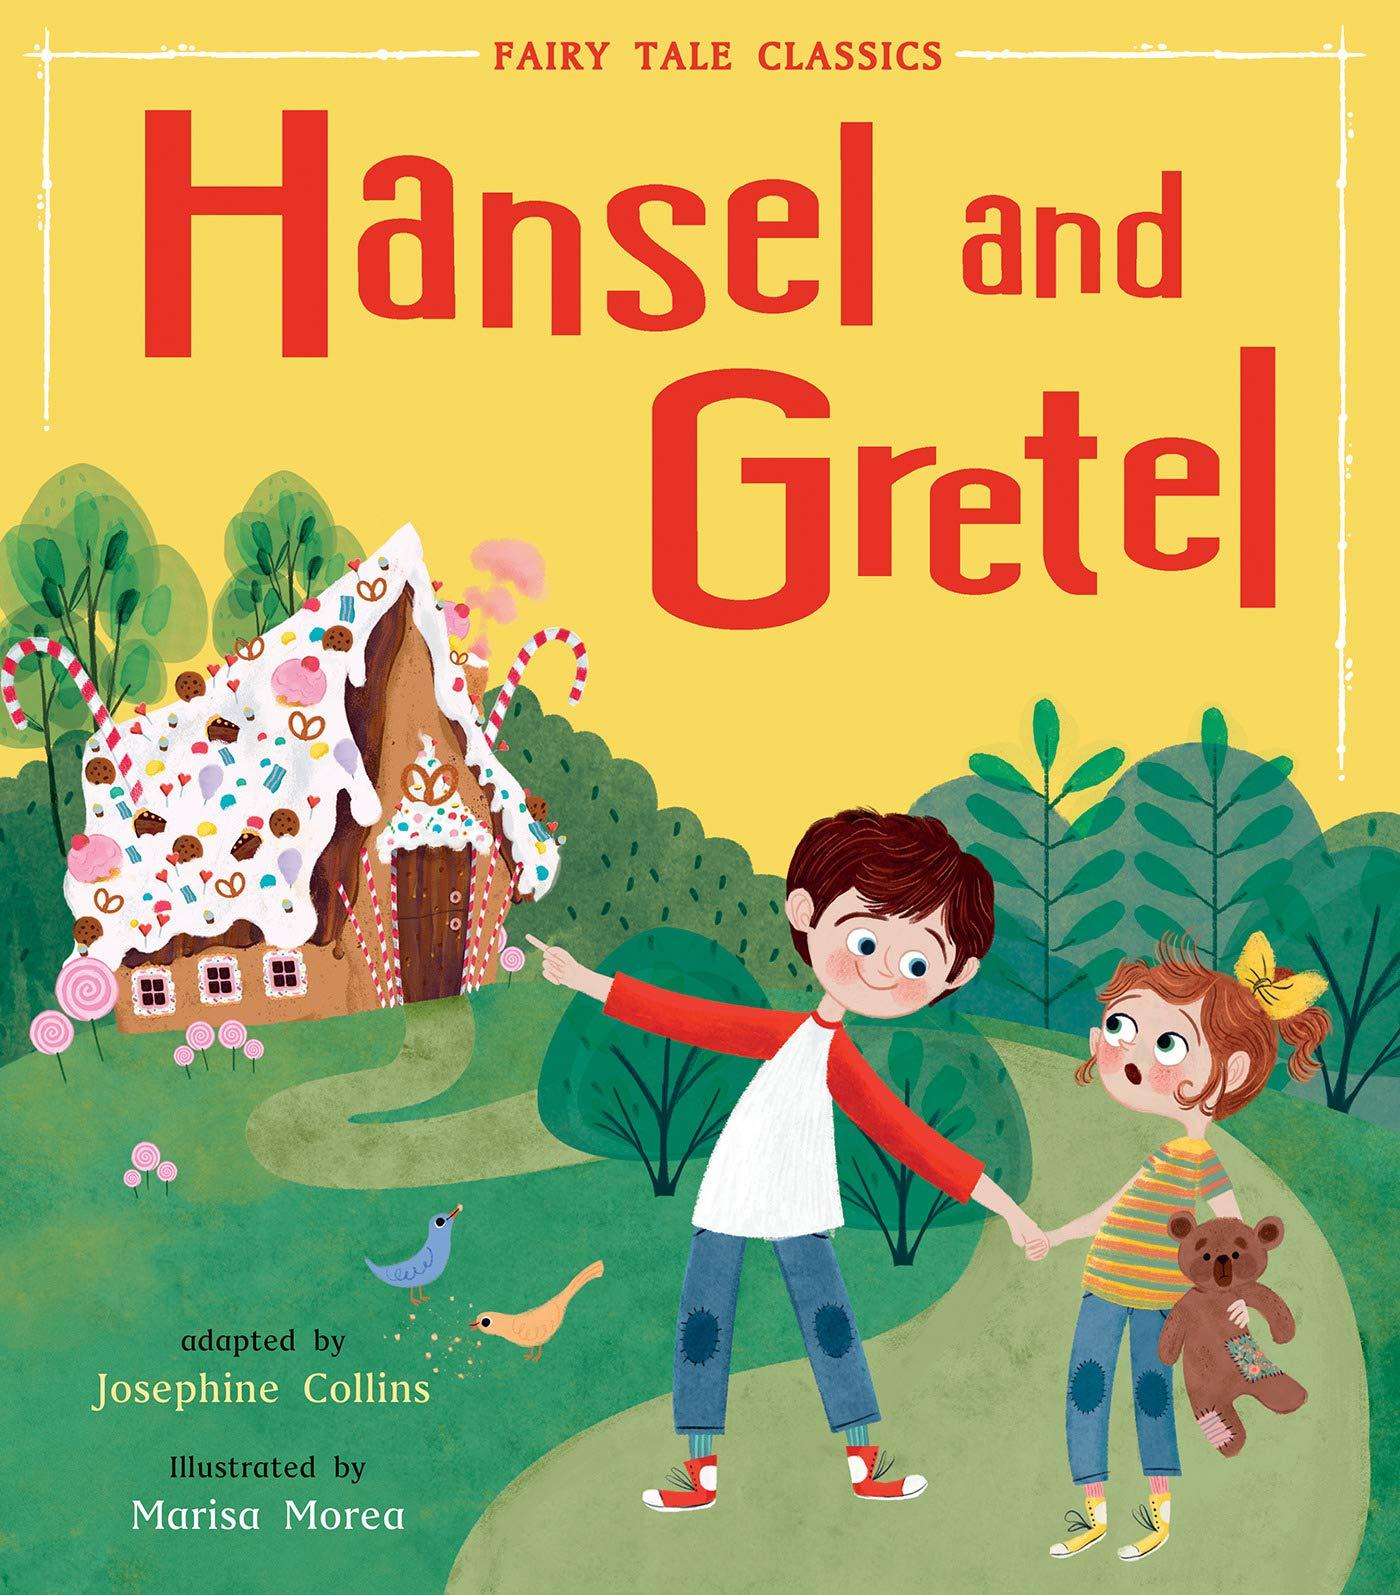 Hansel and Gretel (Fairy Tale Classics): Tiger Tales, Morea, Marisa:  9781680101072: Amazon.com: Books